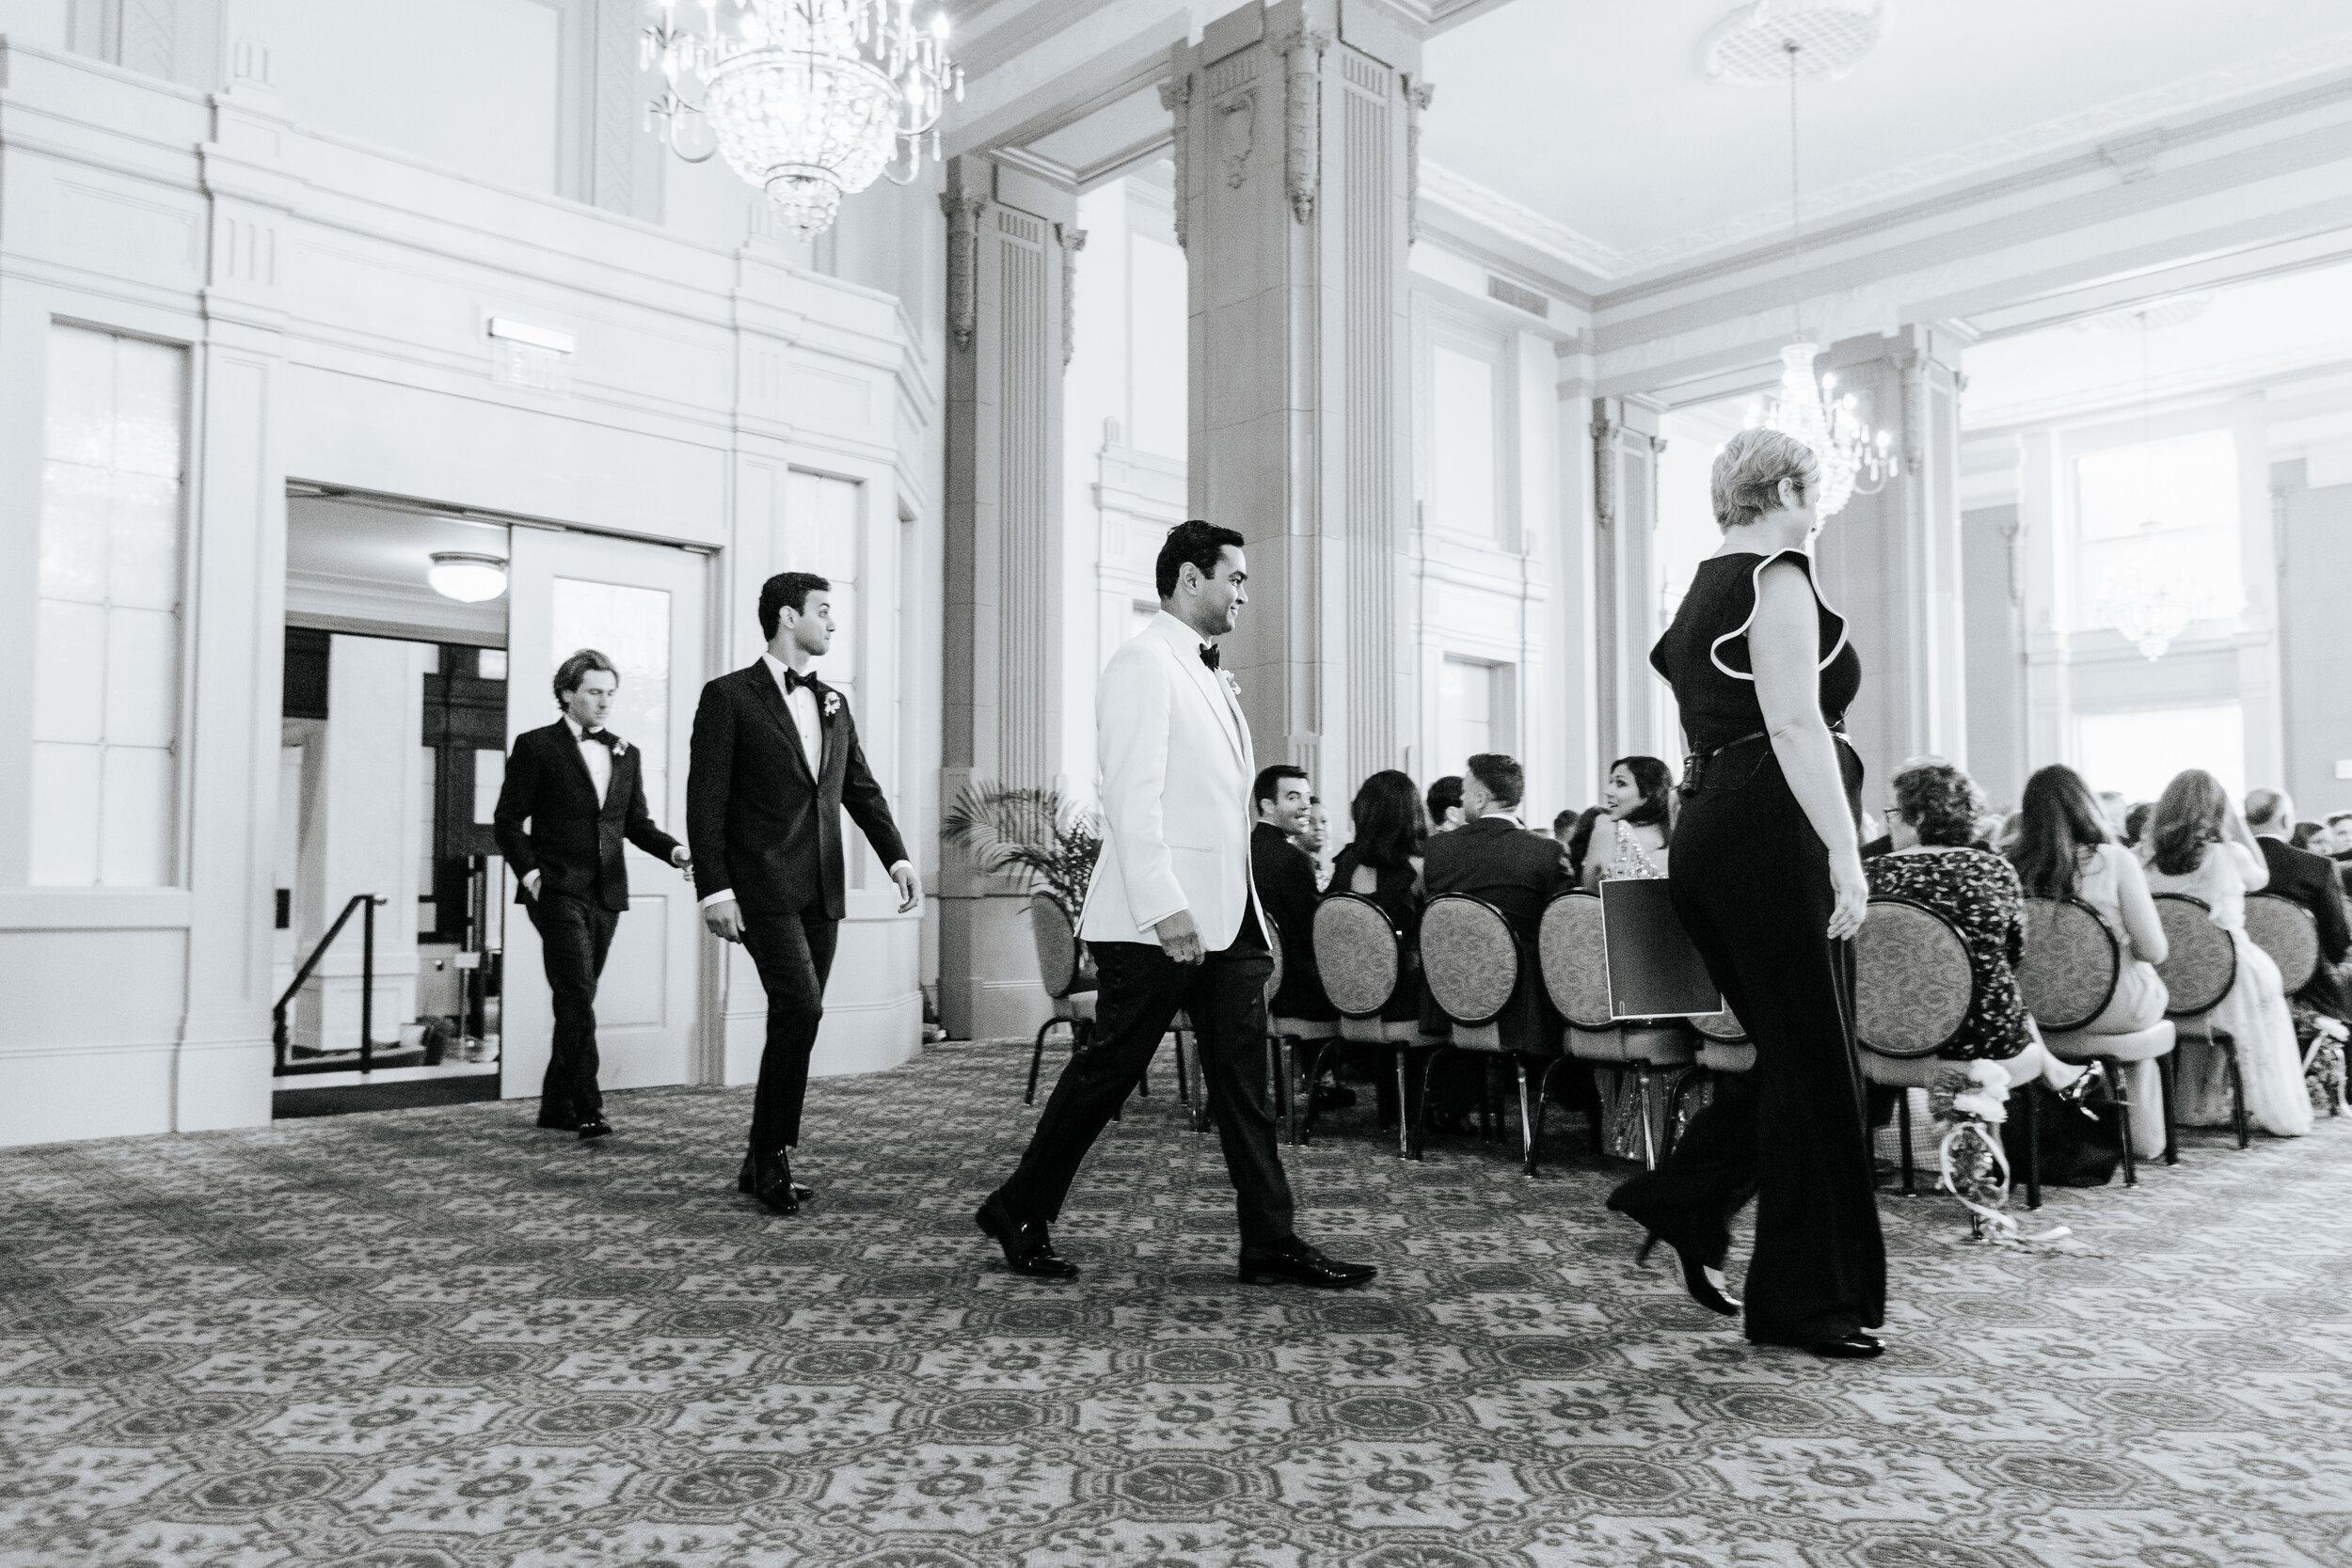 Cassie-Mrunal-Wedding-Quirk-Hotel-John-Marshall-Ballrooms-Richmond-Virginia-Photography-by-V-66.jpg